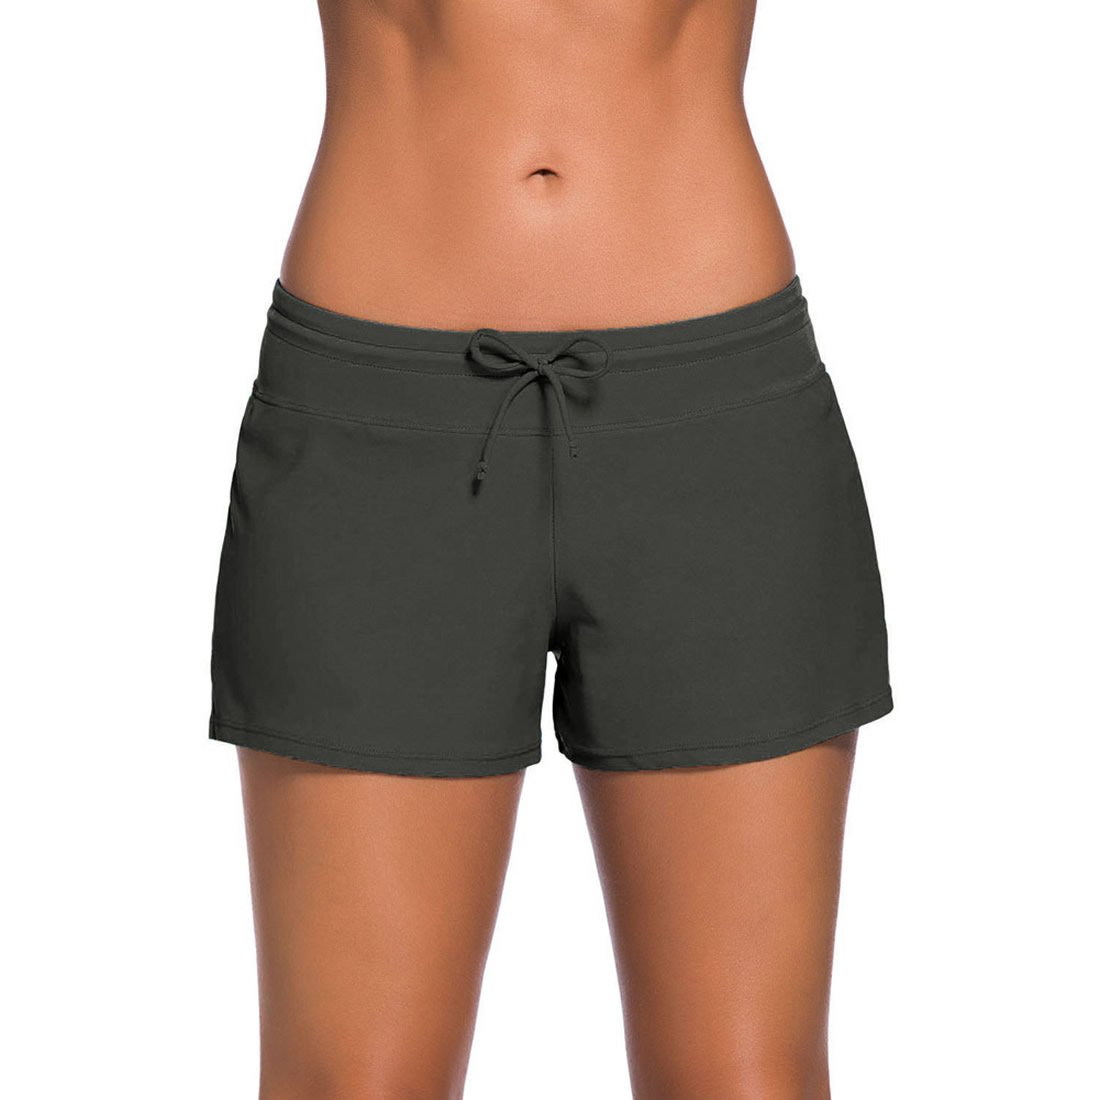 Comeon Women Swim Shorts, Ladies Girls Swimwear Short With Adjustable Drawstring Mini Bikini Swimming Costumes Brief Bottoms Swimsuit Beachwear